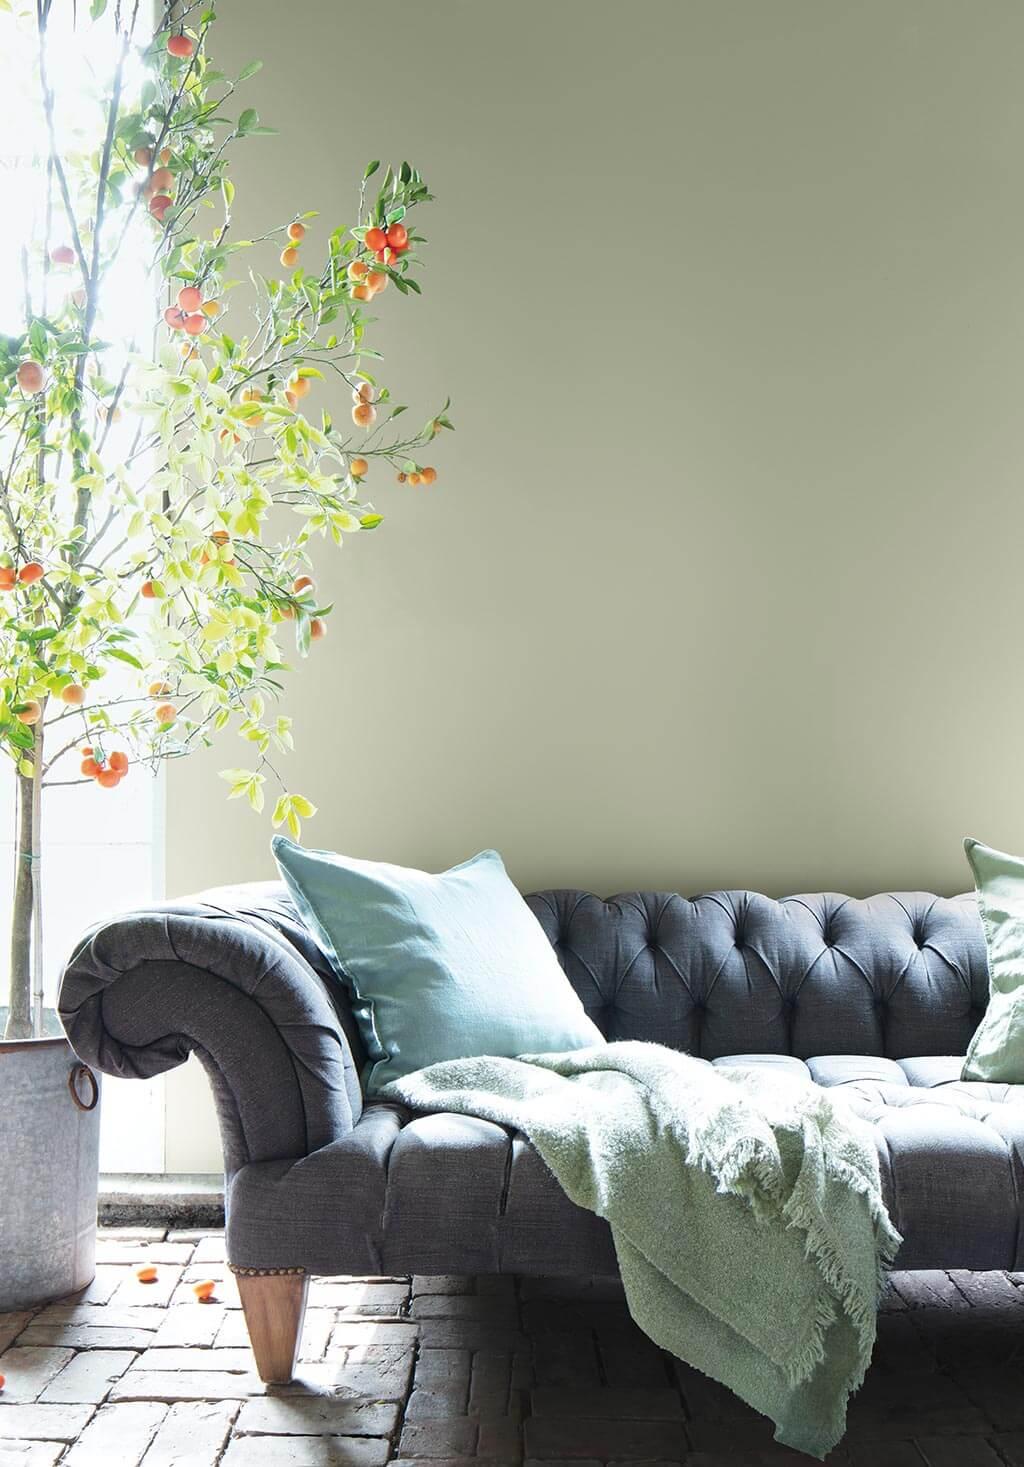 benjamin-moore-october-mist-color-of-the-year-2022-nordroom